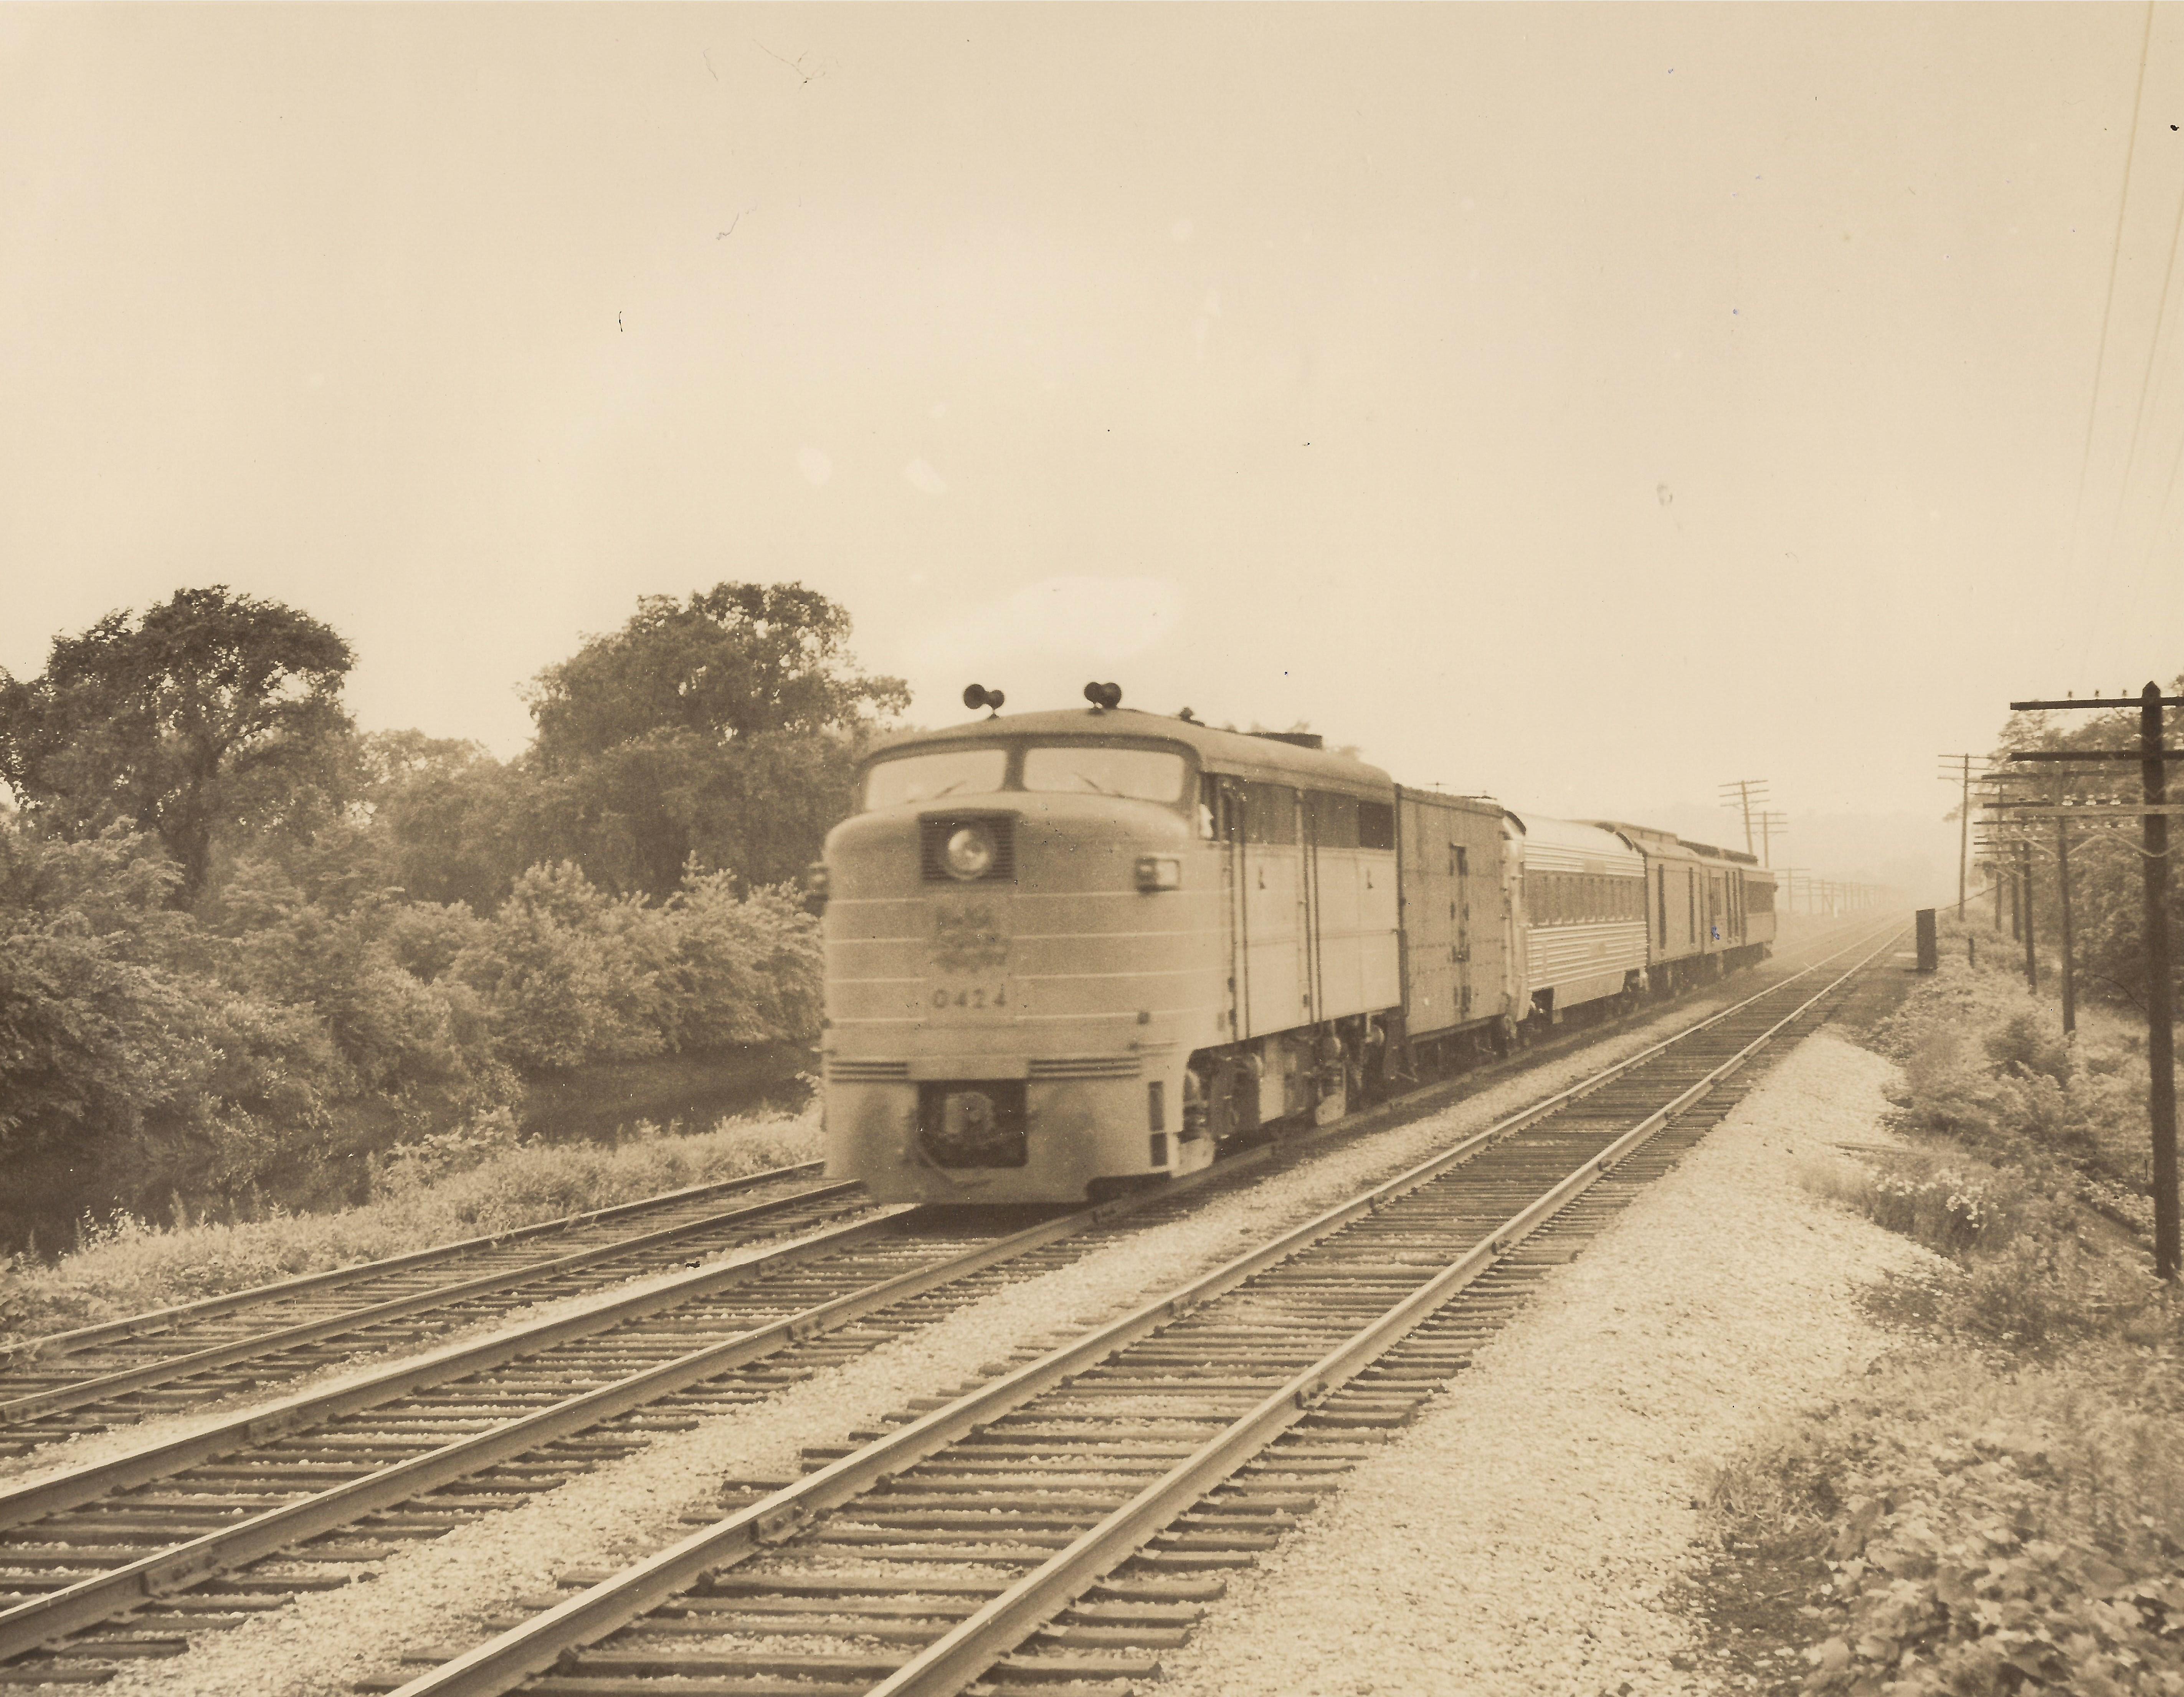 FAs on psgr train 001.jpg